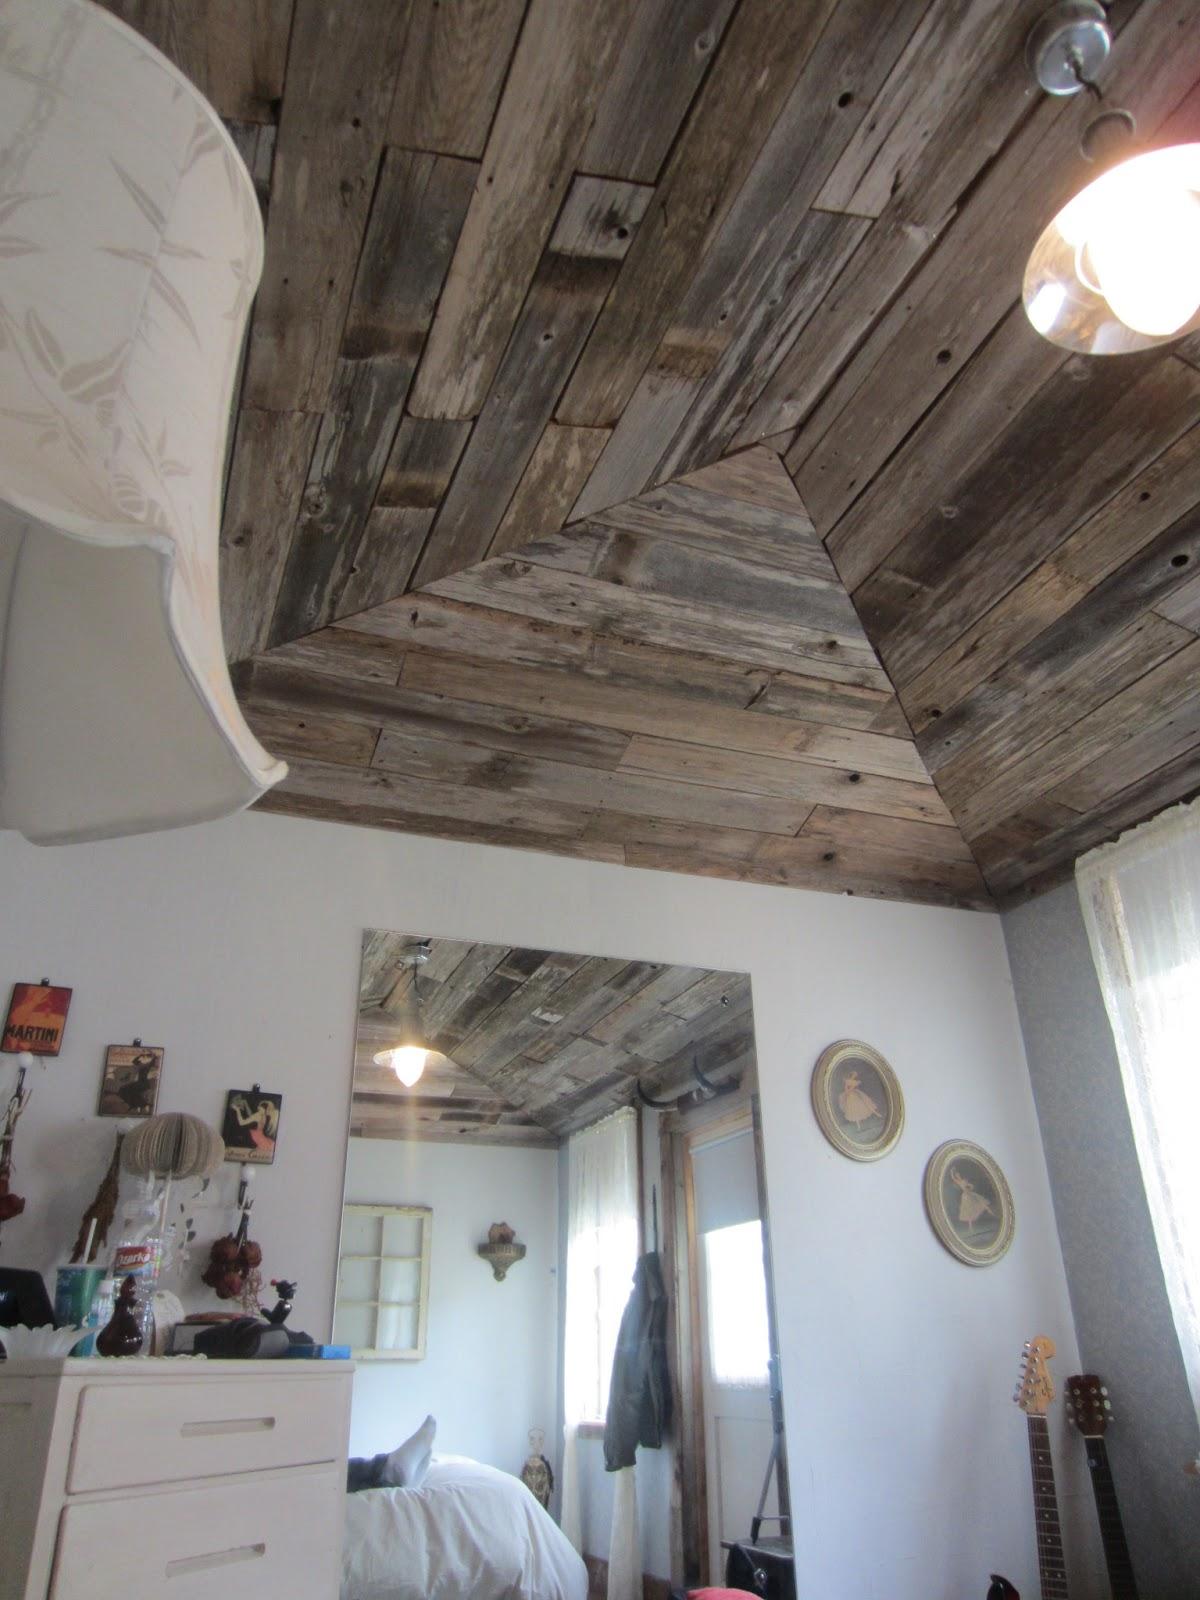 Relaxshacks.com: Barn Board and Fence Lumber Rustic